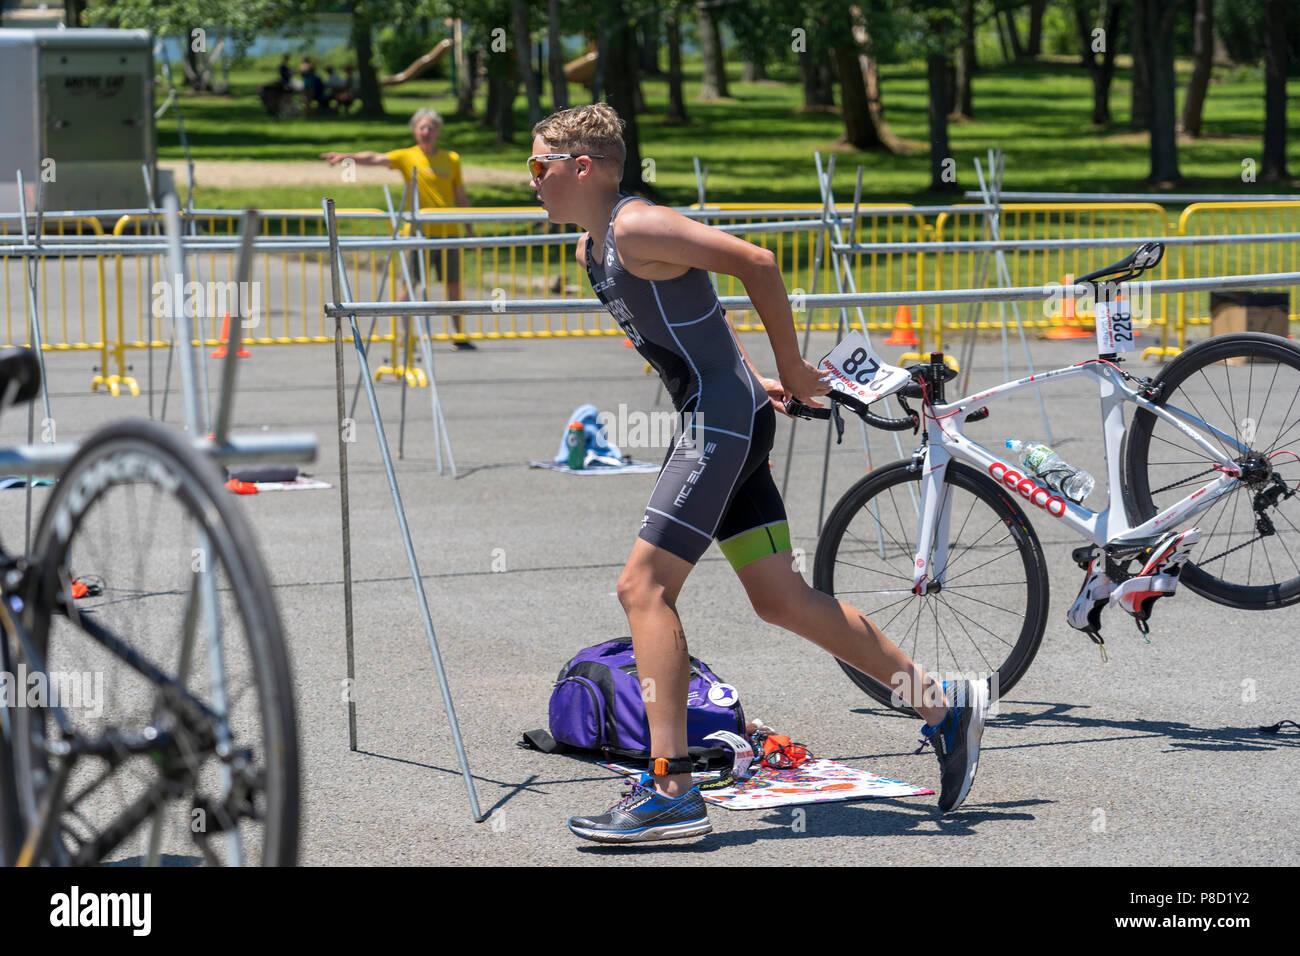 2018 Stissing Kid's Triathlon - Stock Image